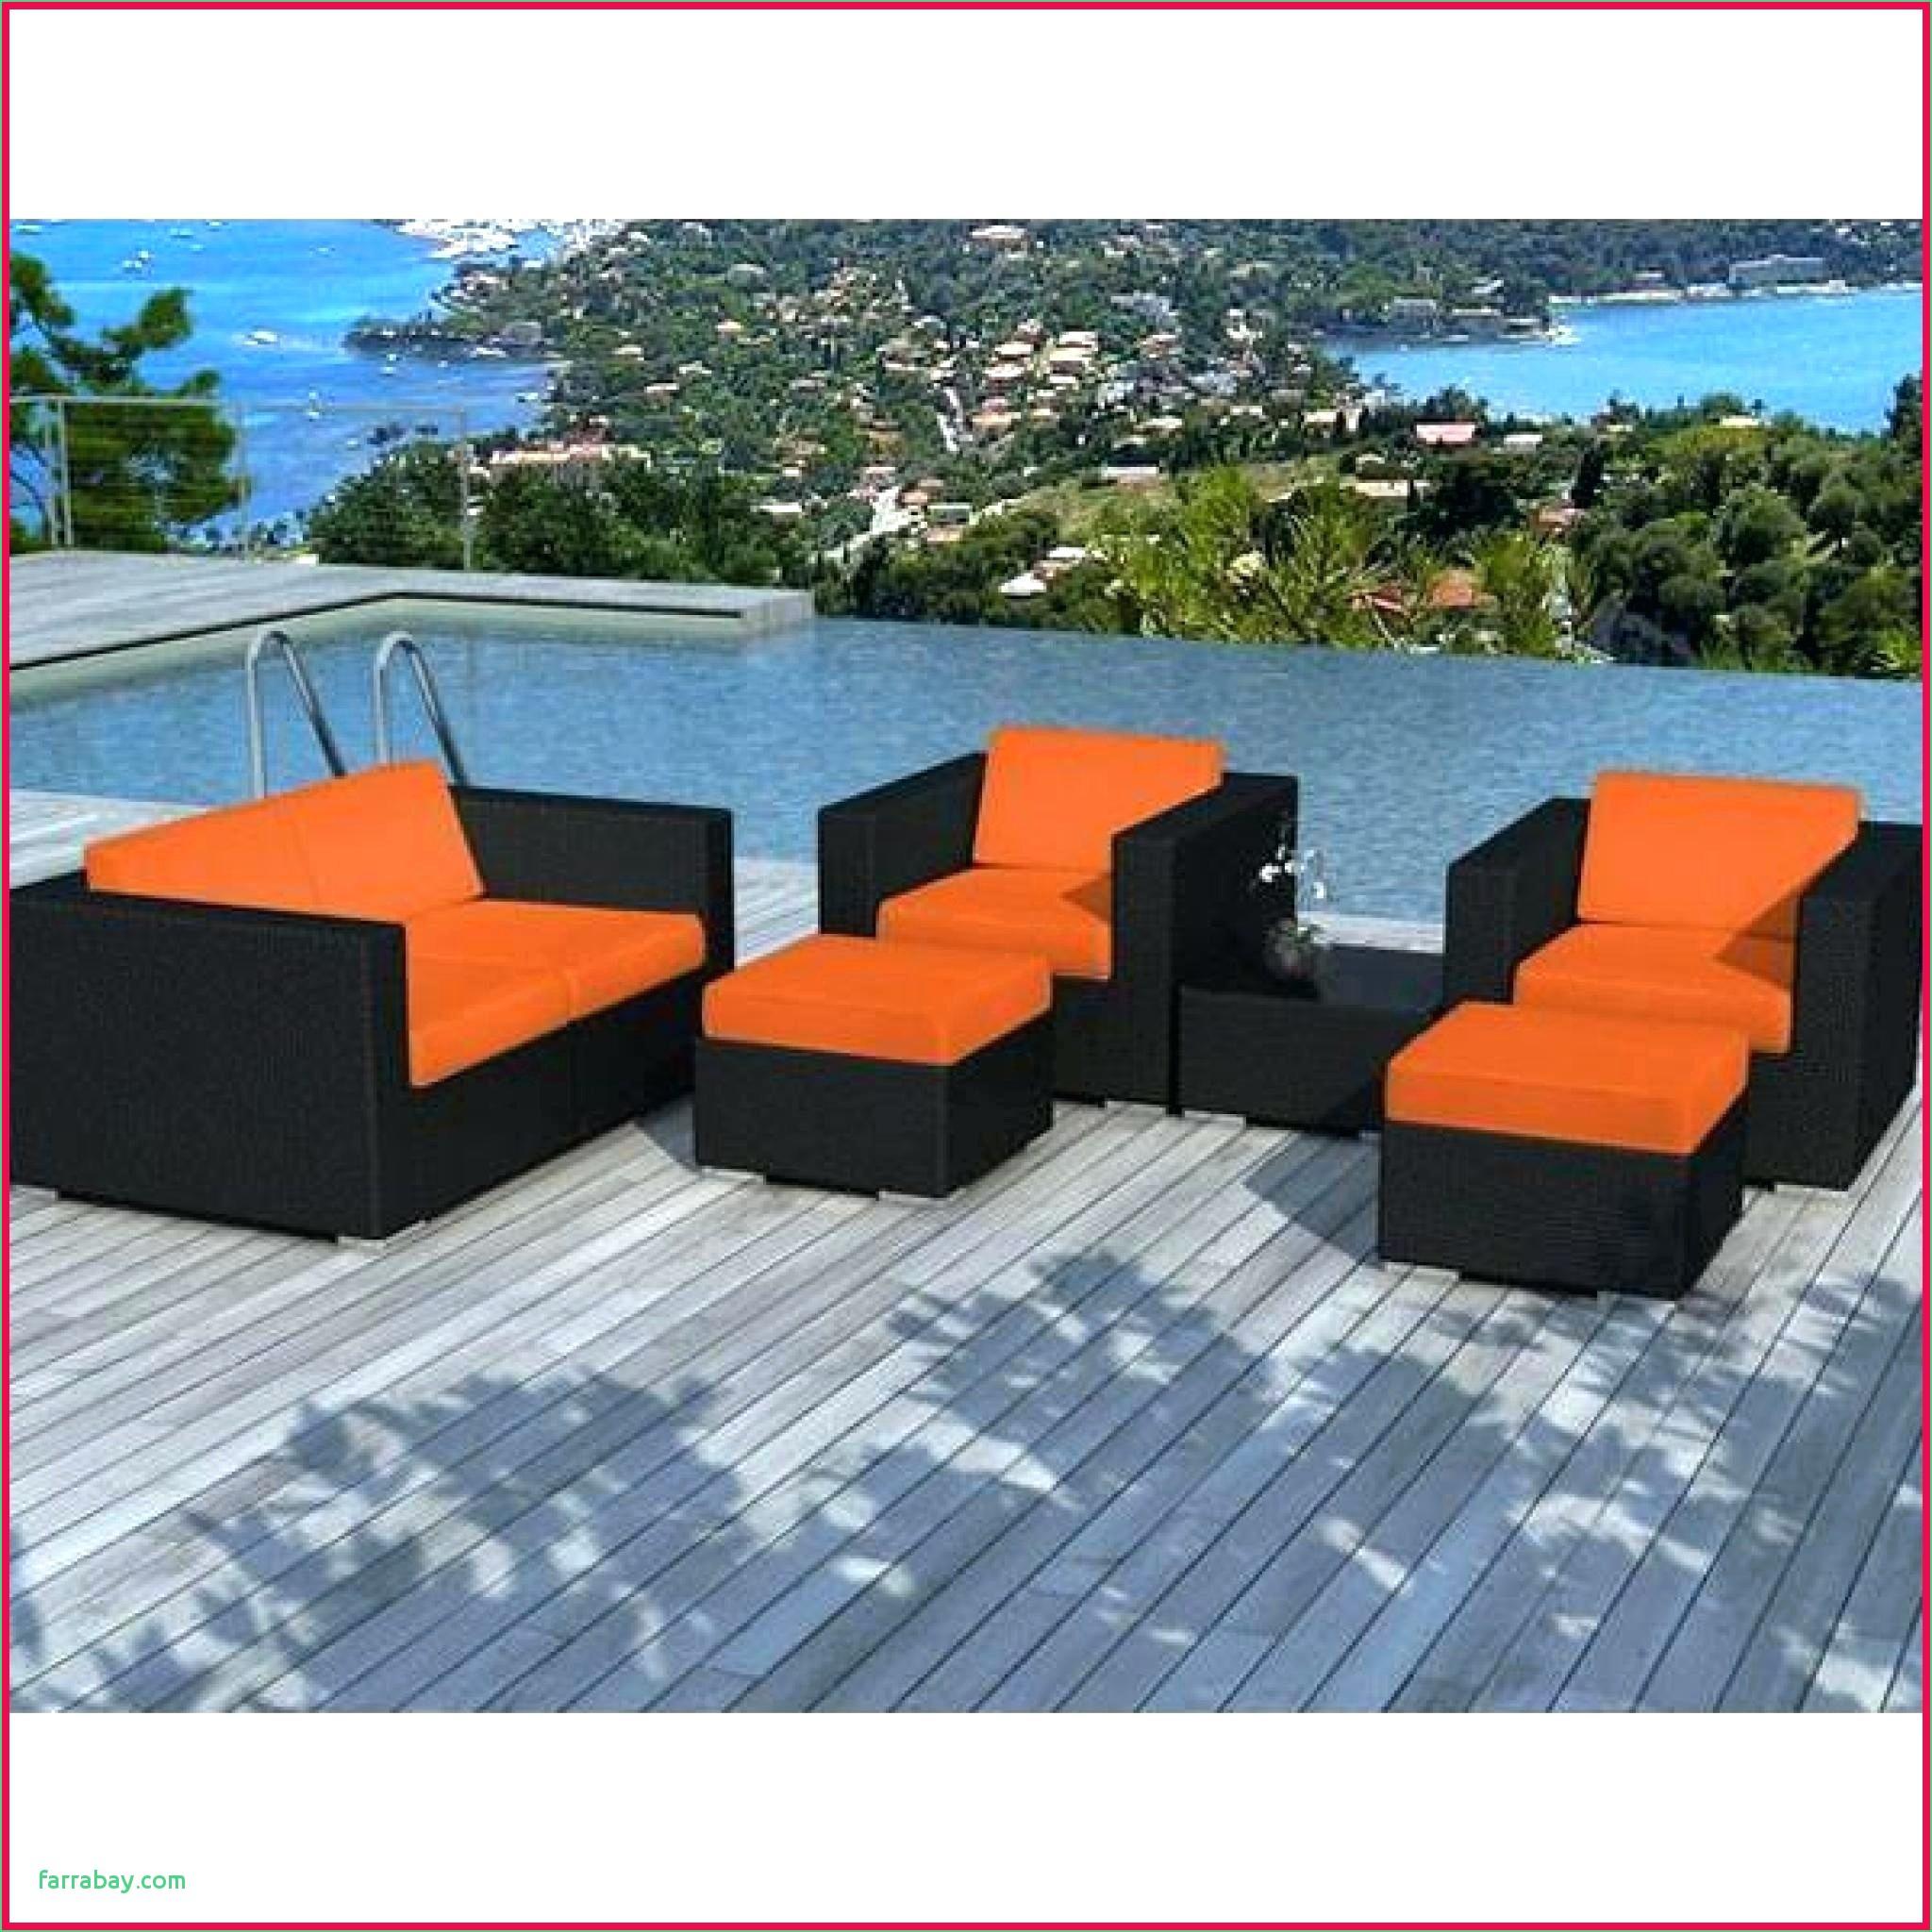 hesperide garden furniture lovely emejing table haute de jardin hesperide amazing house of hesperide garden furniture